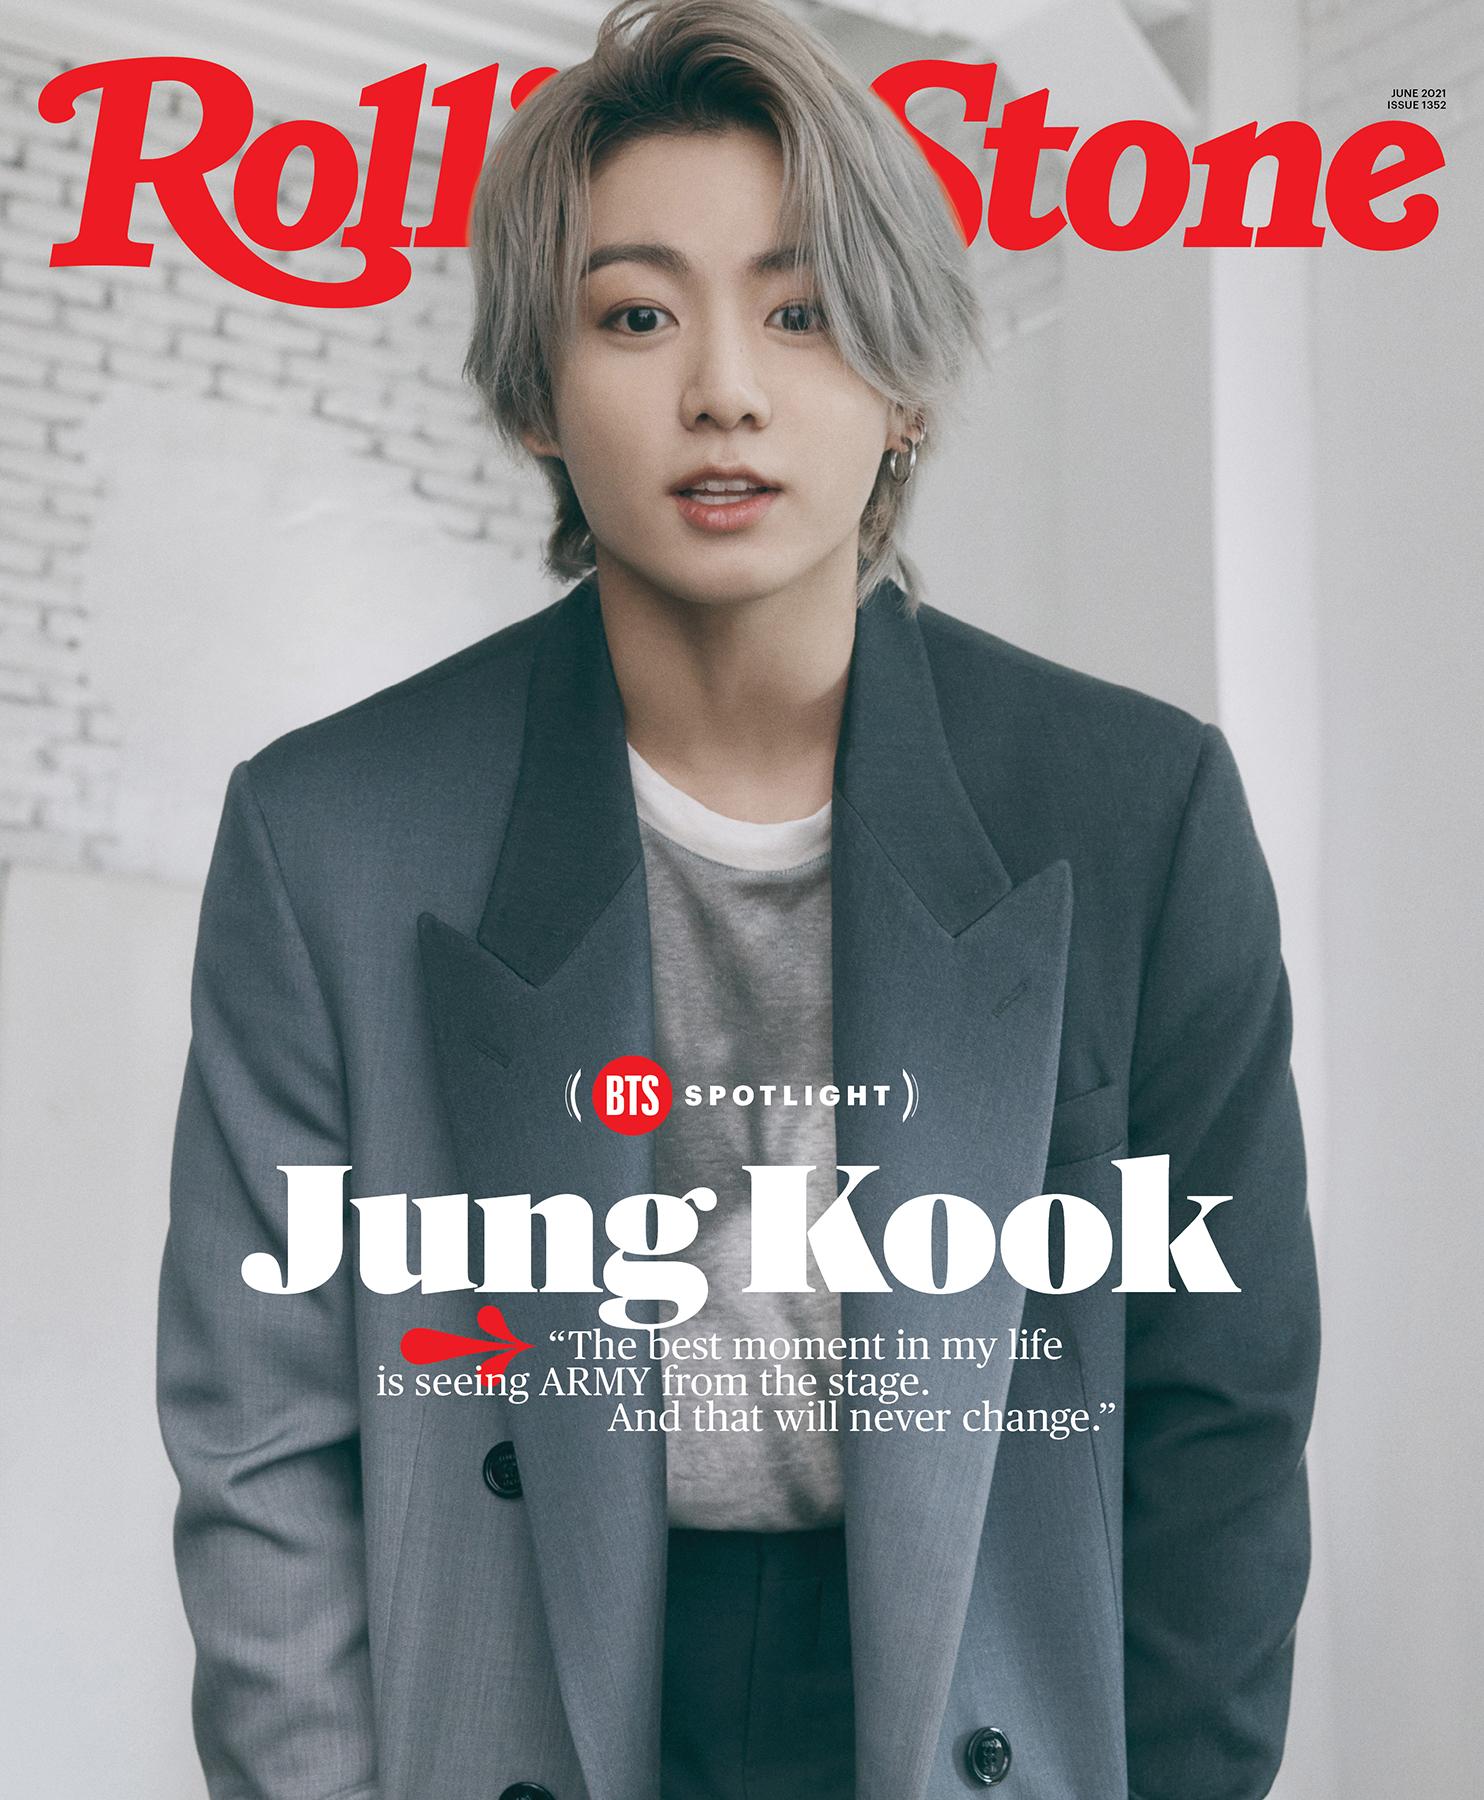 bts jung kook rolling stone cover bangtan boys big hit